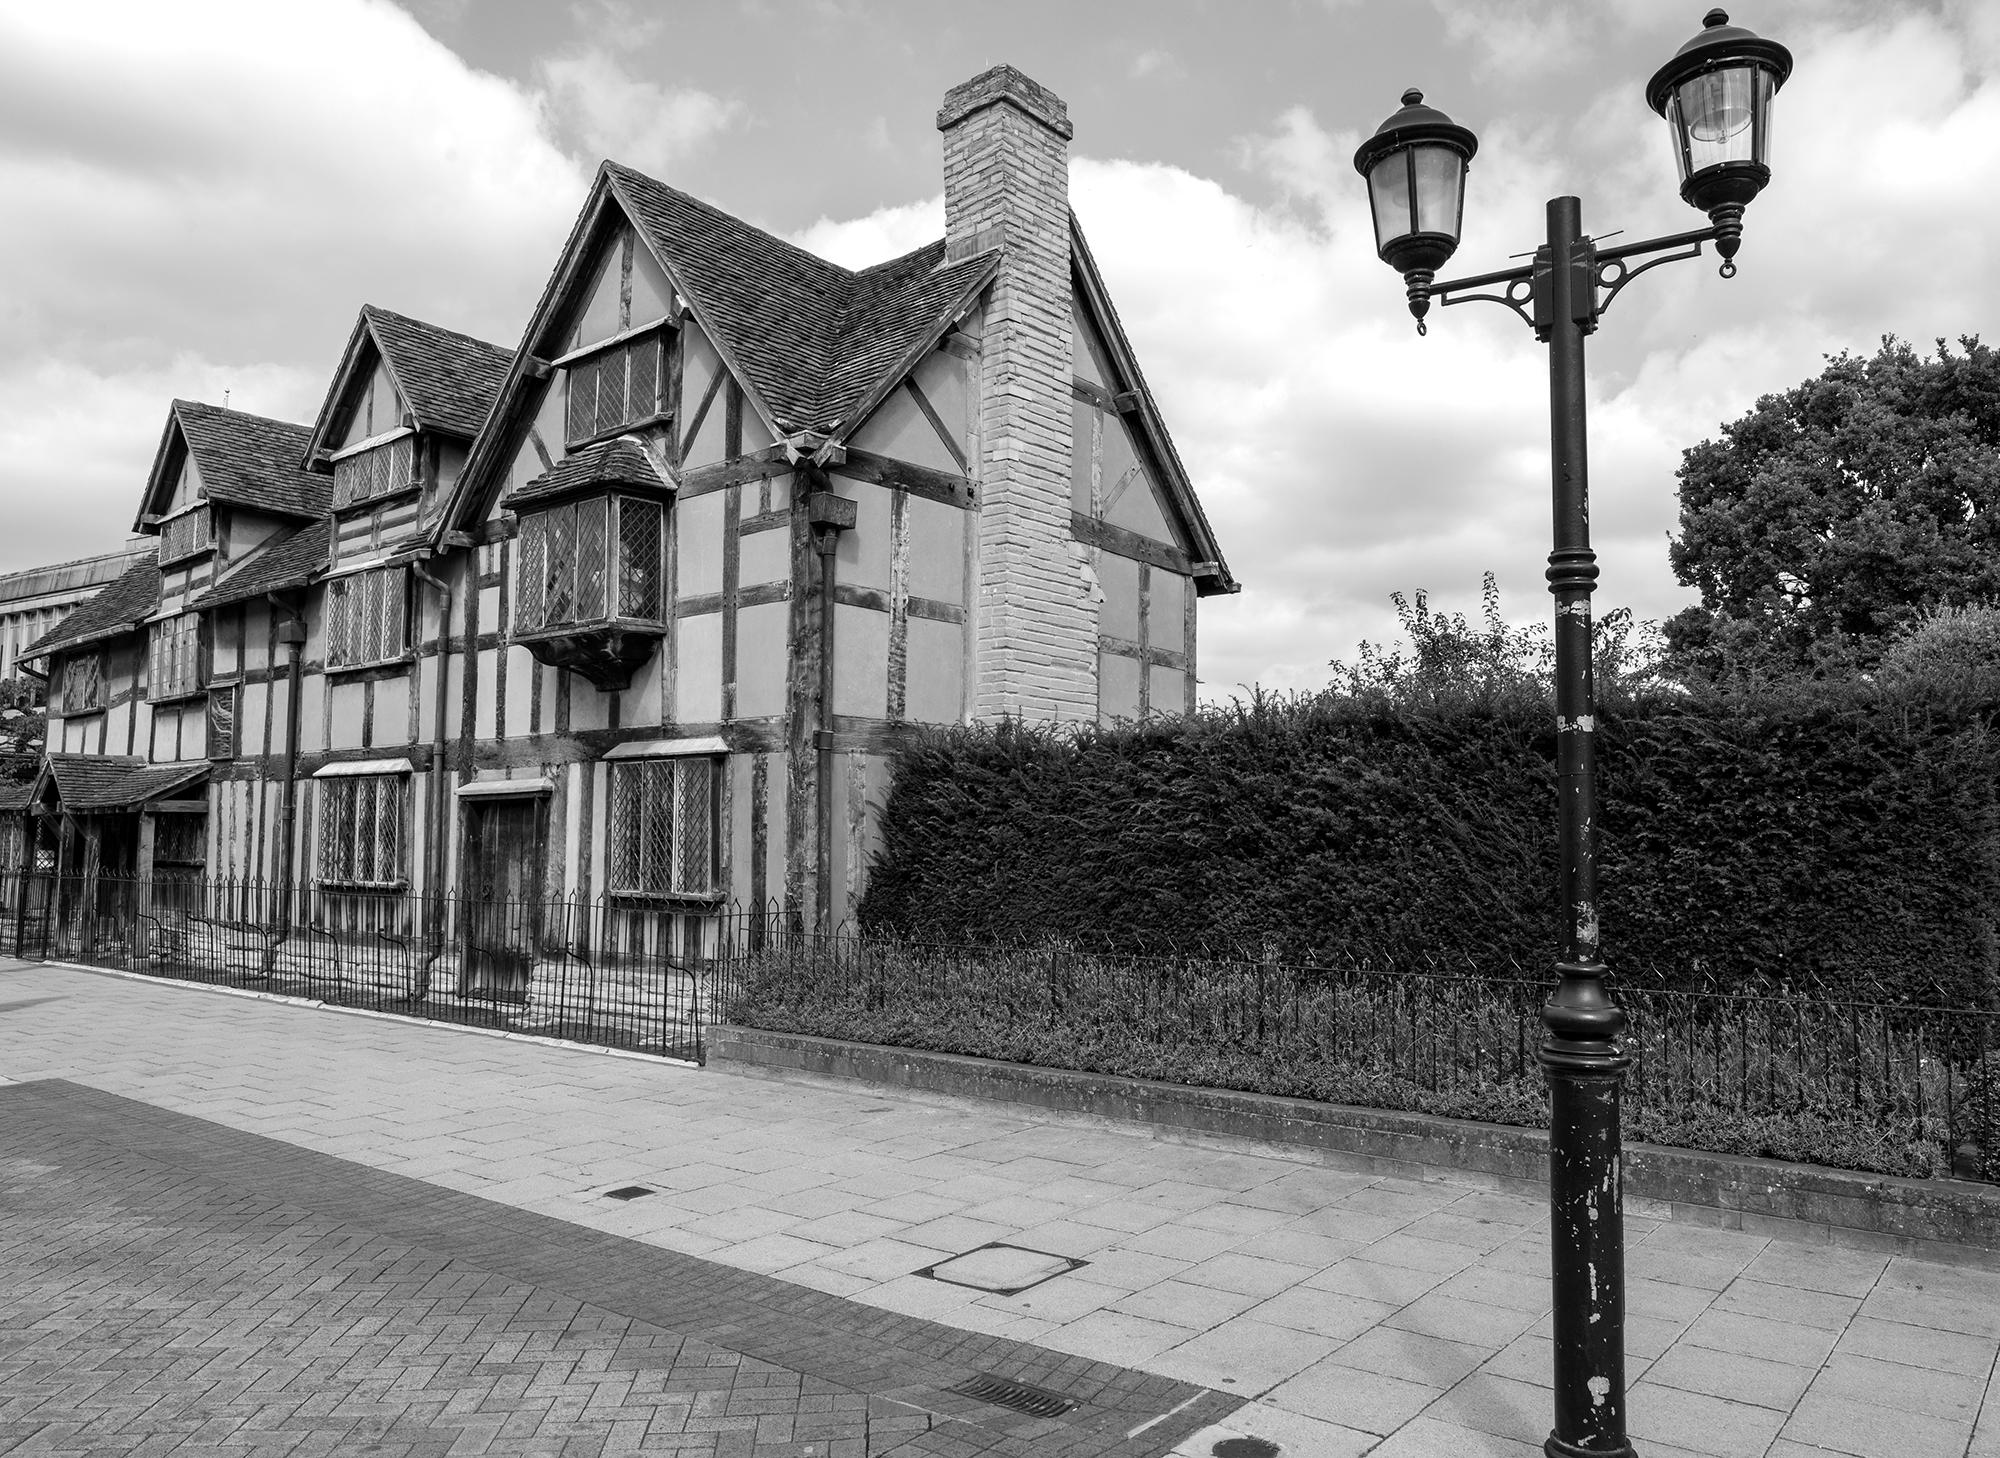 william shakespears house